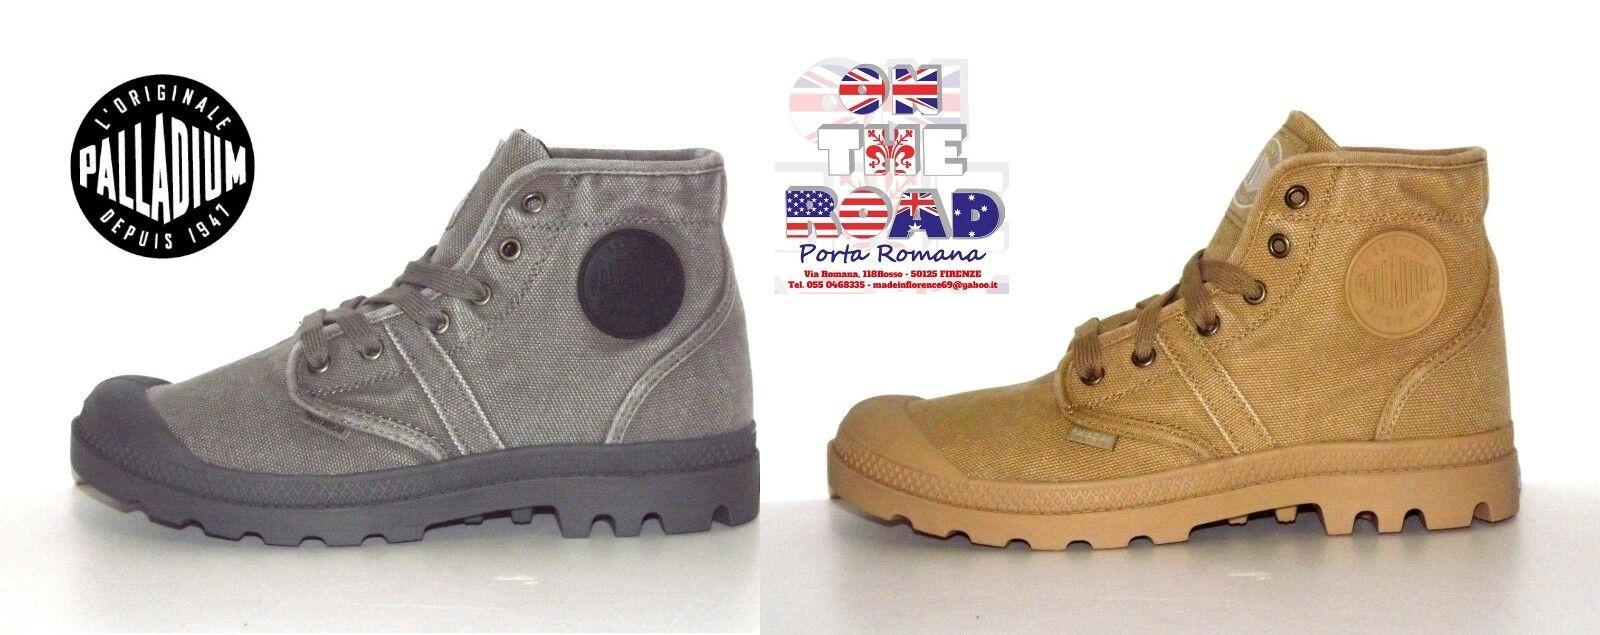 SCONTO 10% PALLADIUM PALLADIUM 10% BOOTS PALLABROUSE 42 43 46 STIVALETTI Zapatos zapatillaS 3432b0